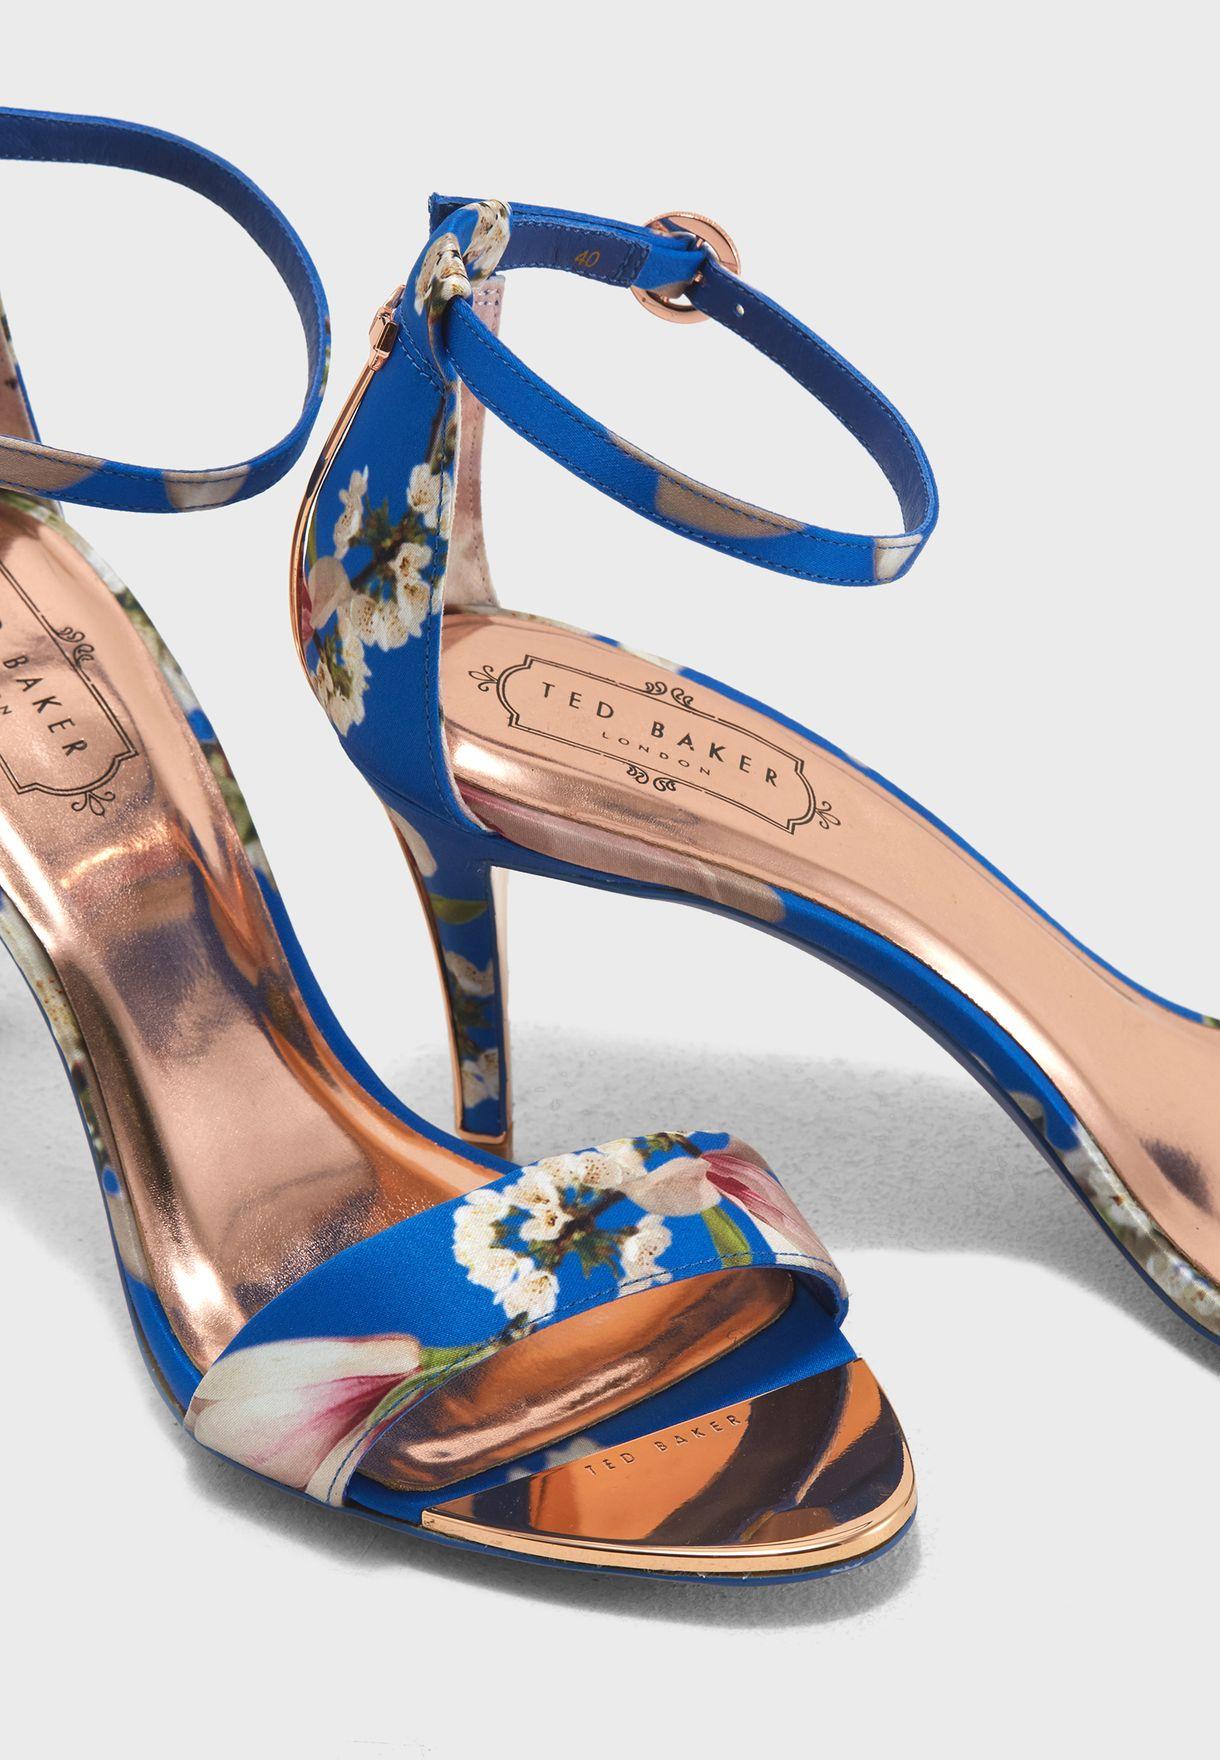 Shop Ted baker prints MAVBE Ankle Strap Sandals 917436 for Women in ...